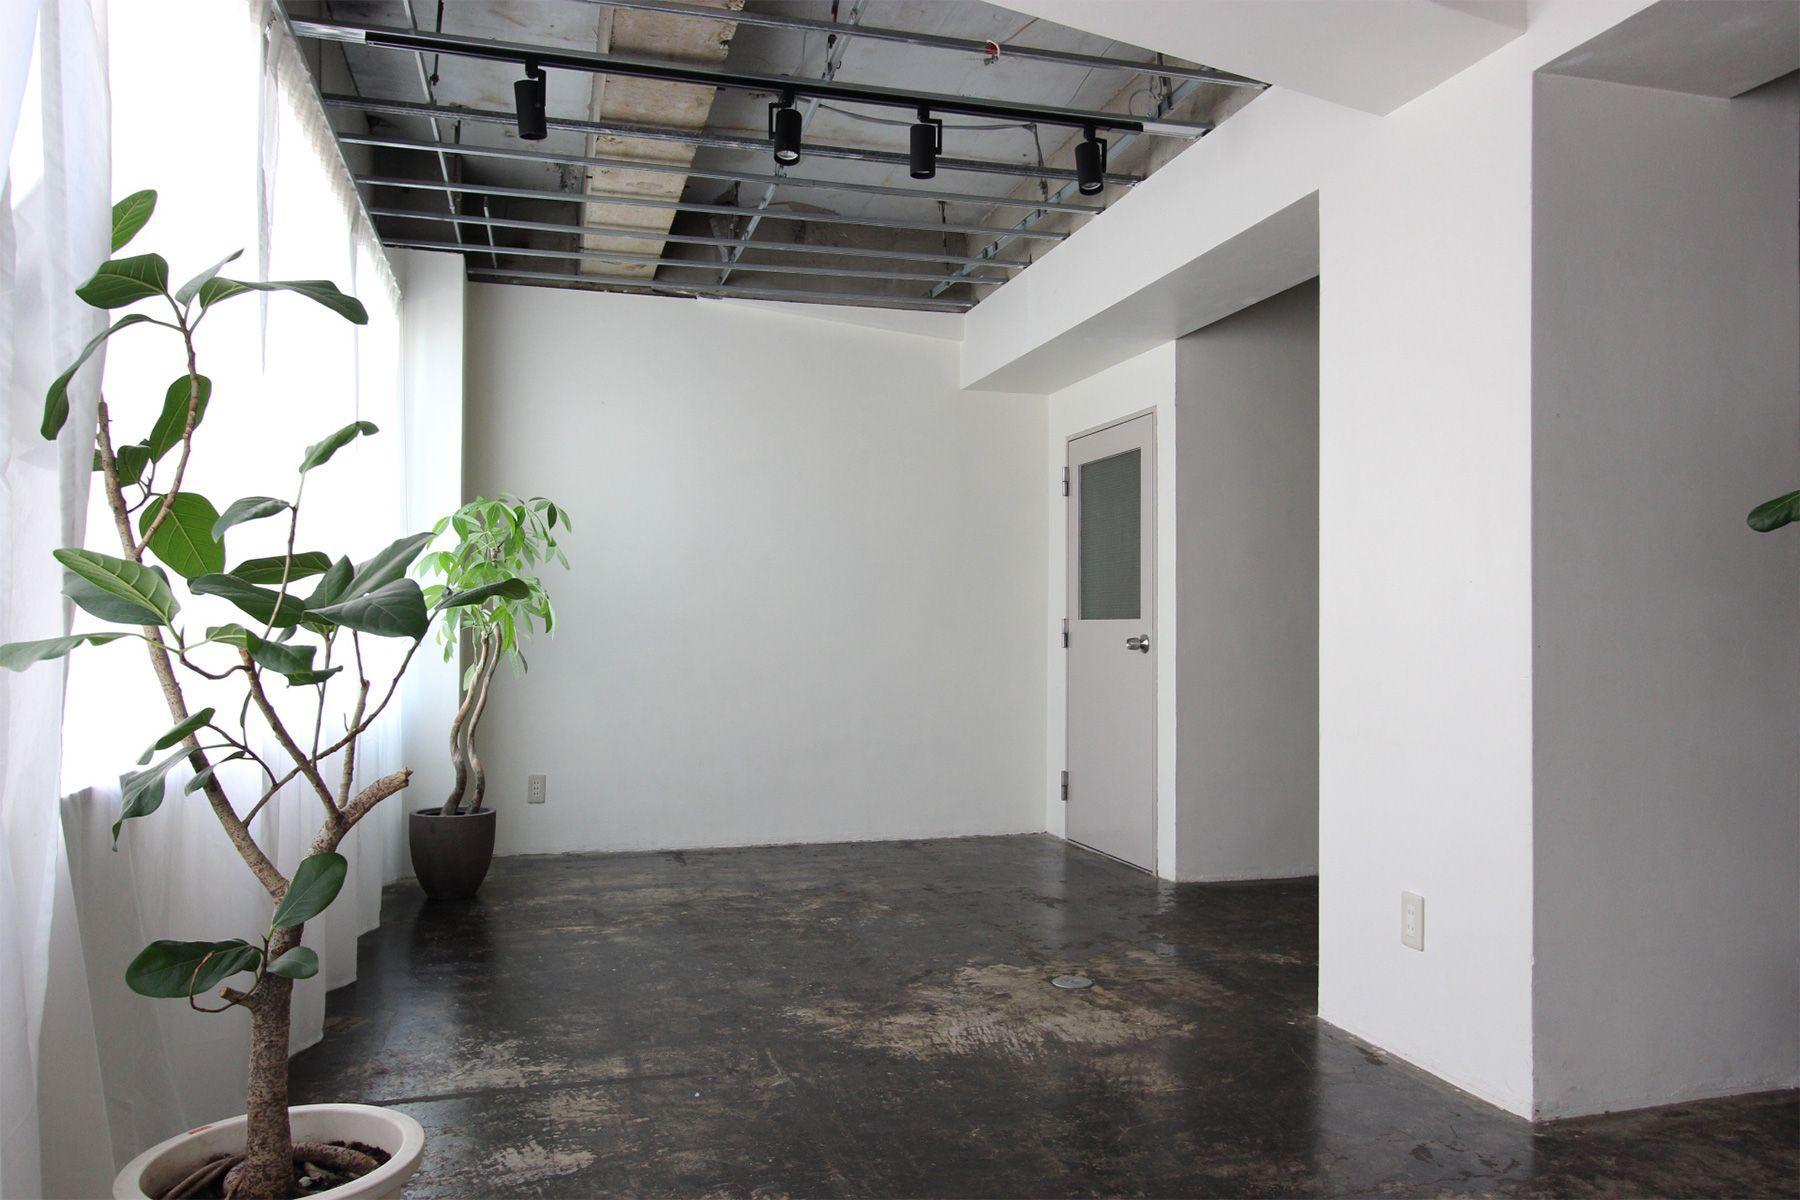 Studio EcoDeco (スタジオエコデコ)白壁